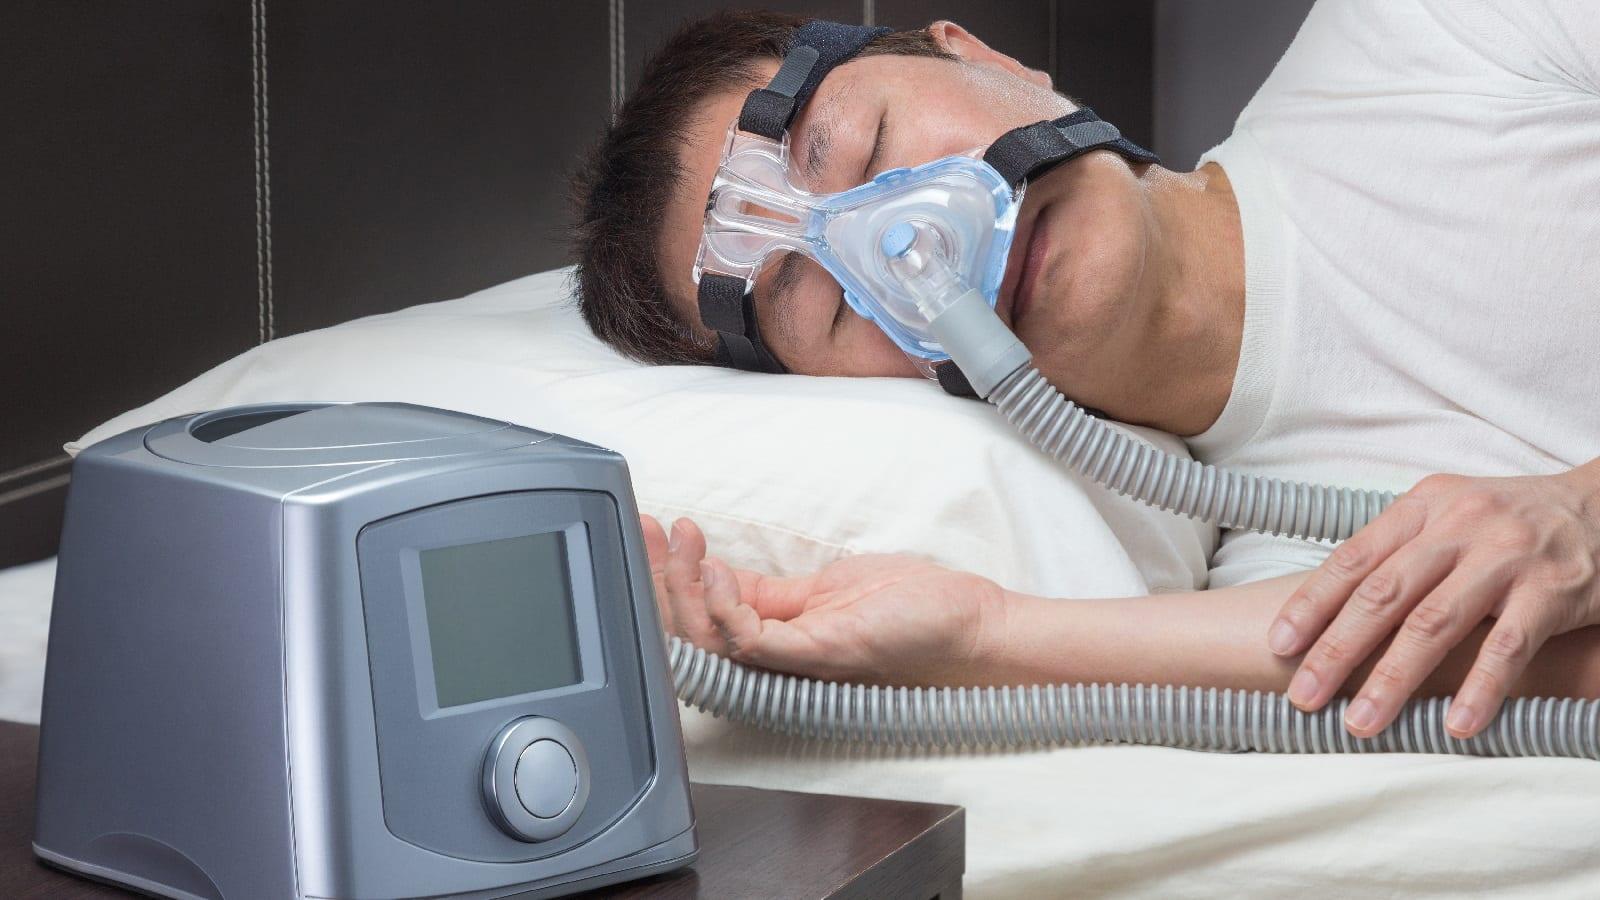 Man asleep with CPAP machine